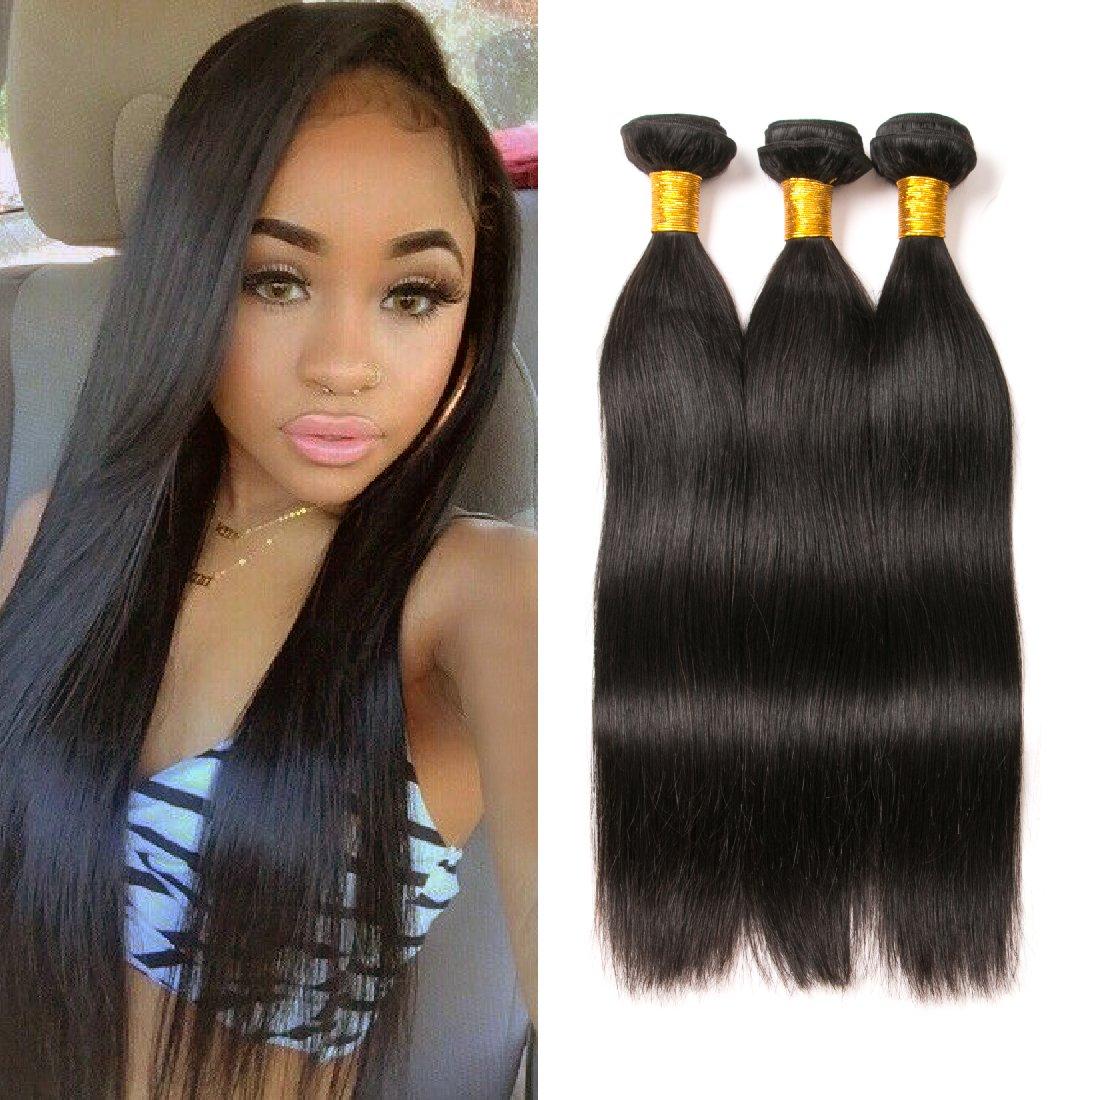 BrasilienIn gerade Haarbündel brasilianischen Jungfrau Haar gerade Bündel brasilianisches Haar 3 Bundles 100% menschliche Haarverlängerungen XTension gemischte Länge (16 16 16) Inch Natural Black Xuchangjiujiuji